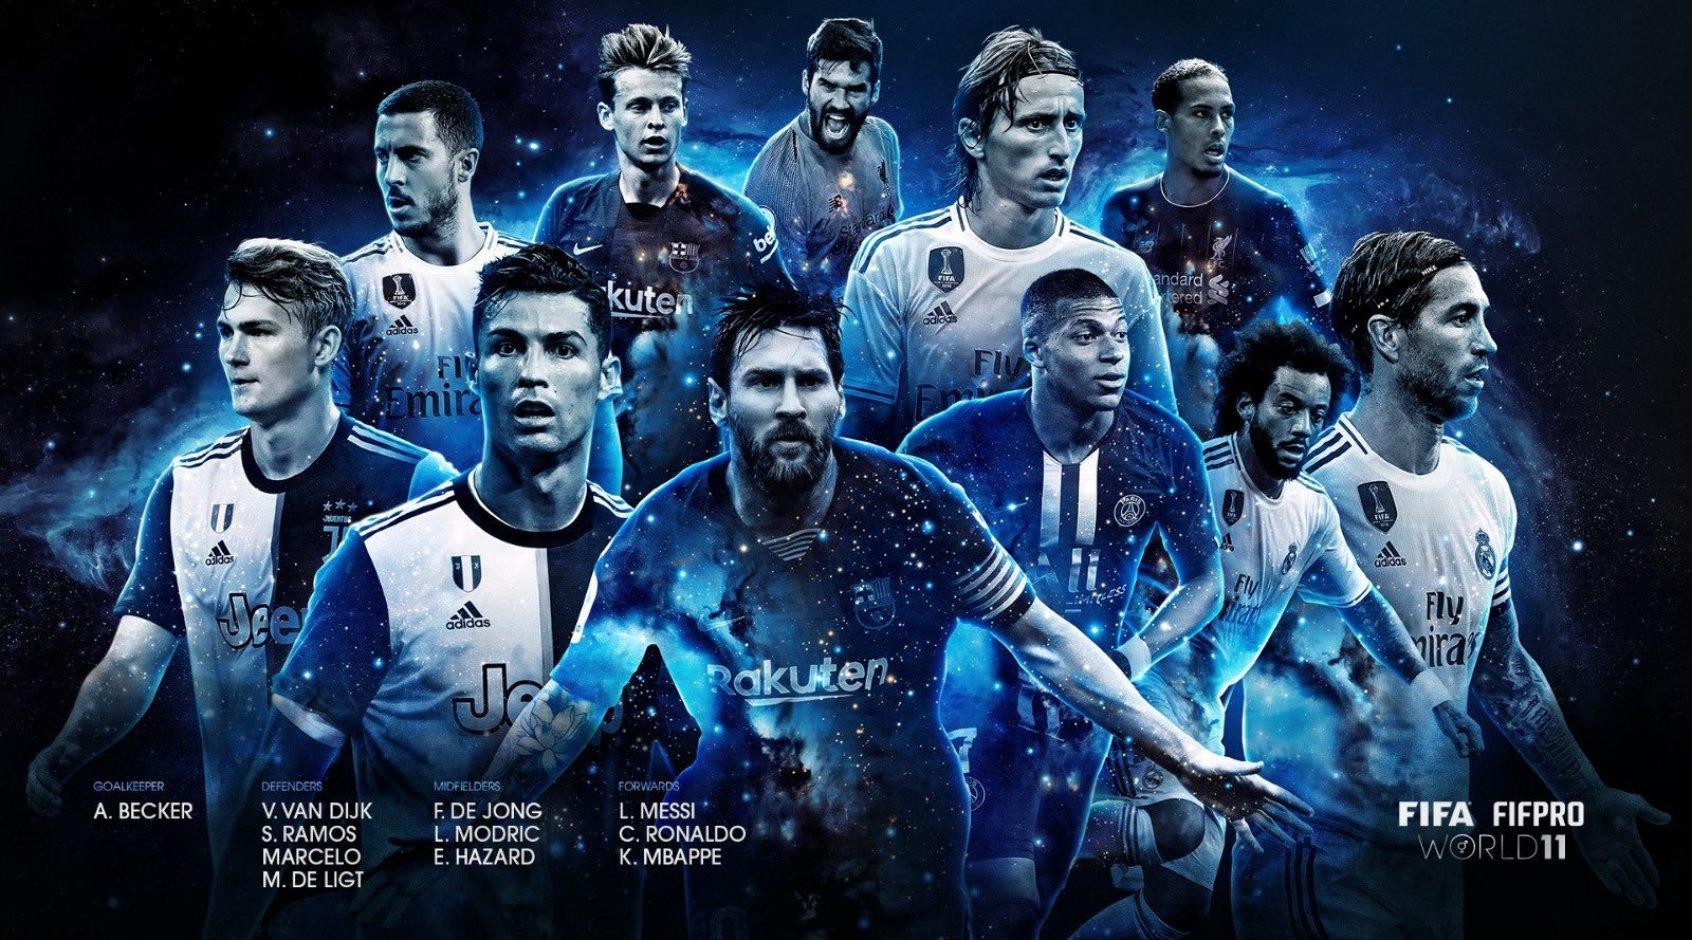 ФИФА назвала команду года